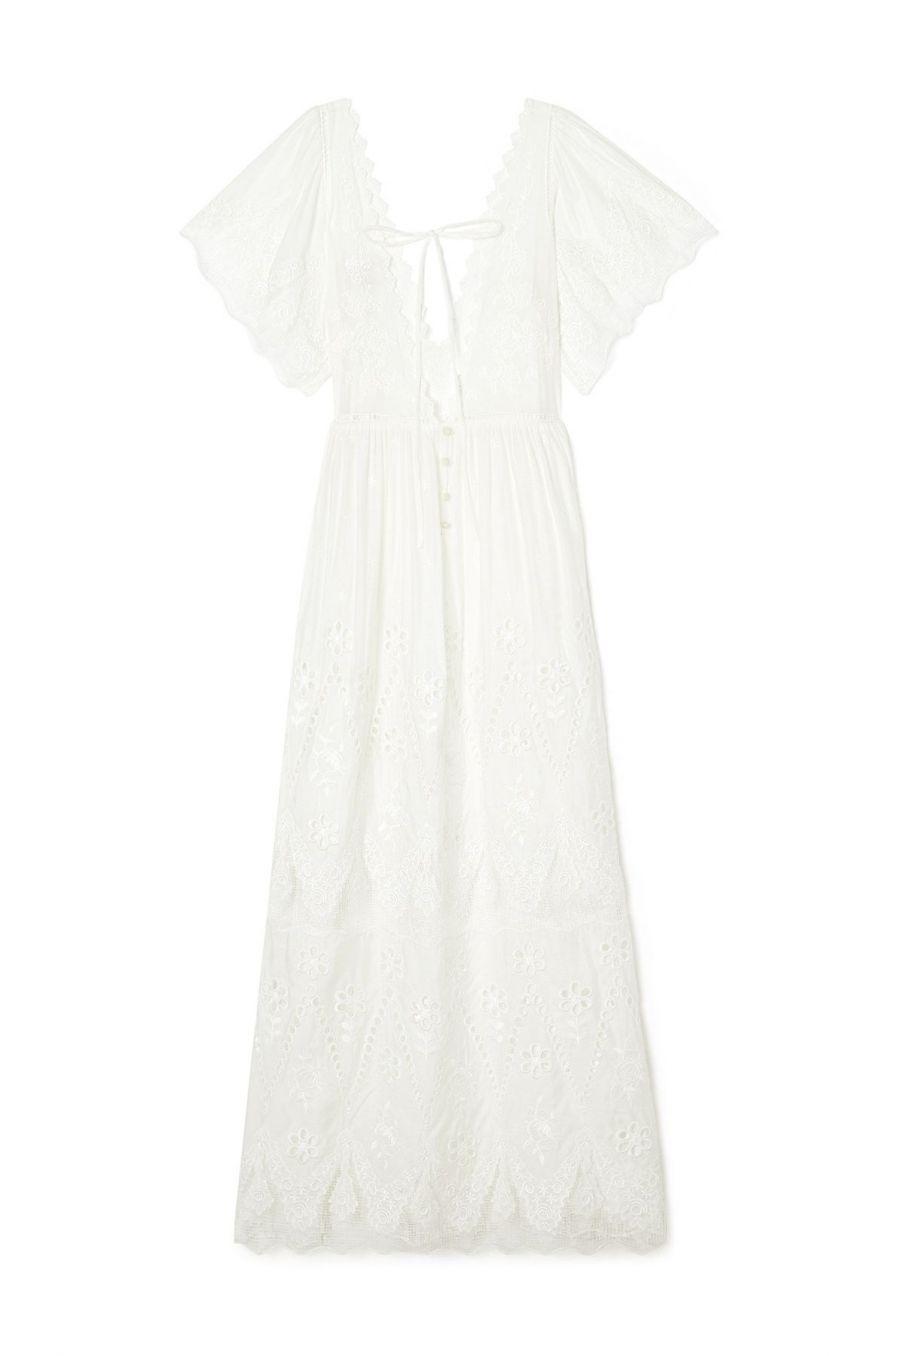 boheme chic vintage robe de mariée femme alice ecru